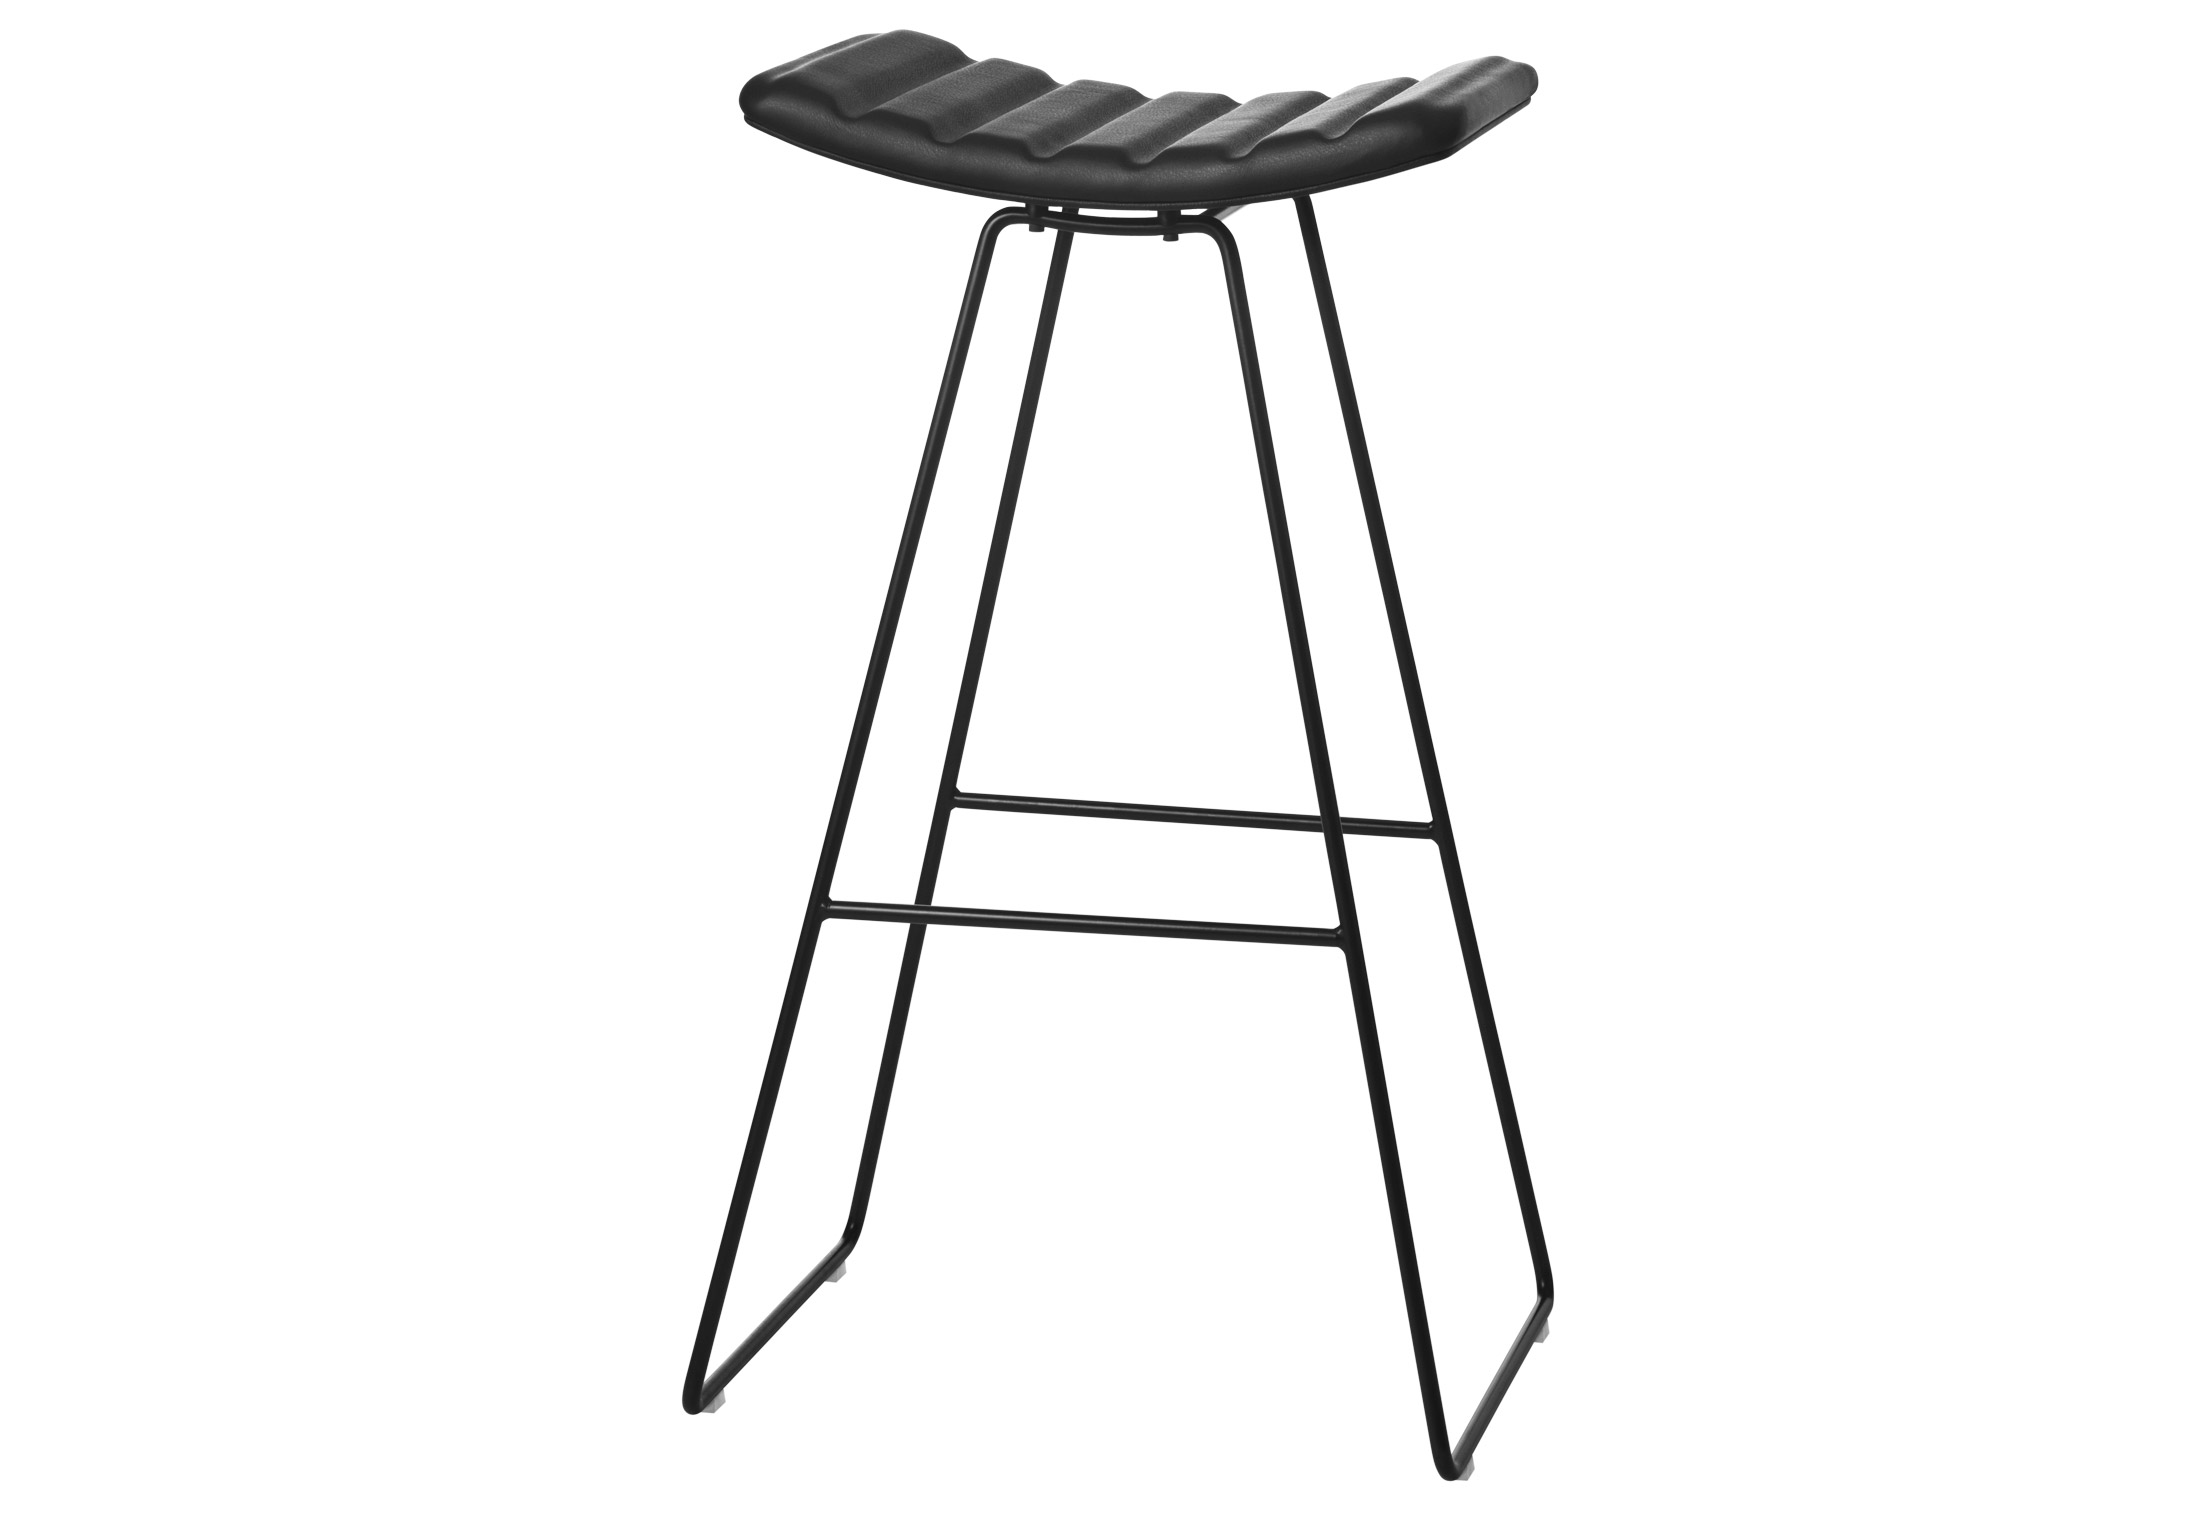 a3 stool by gubi